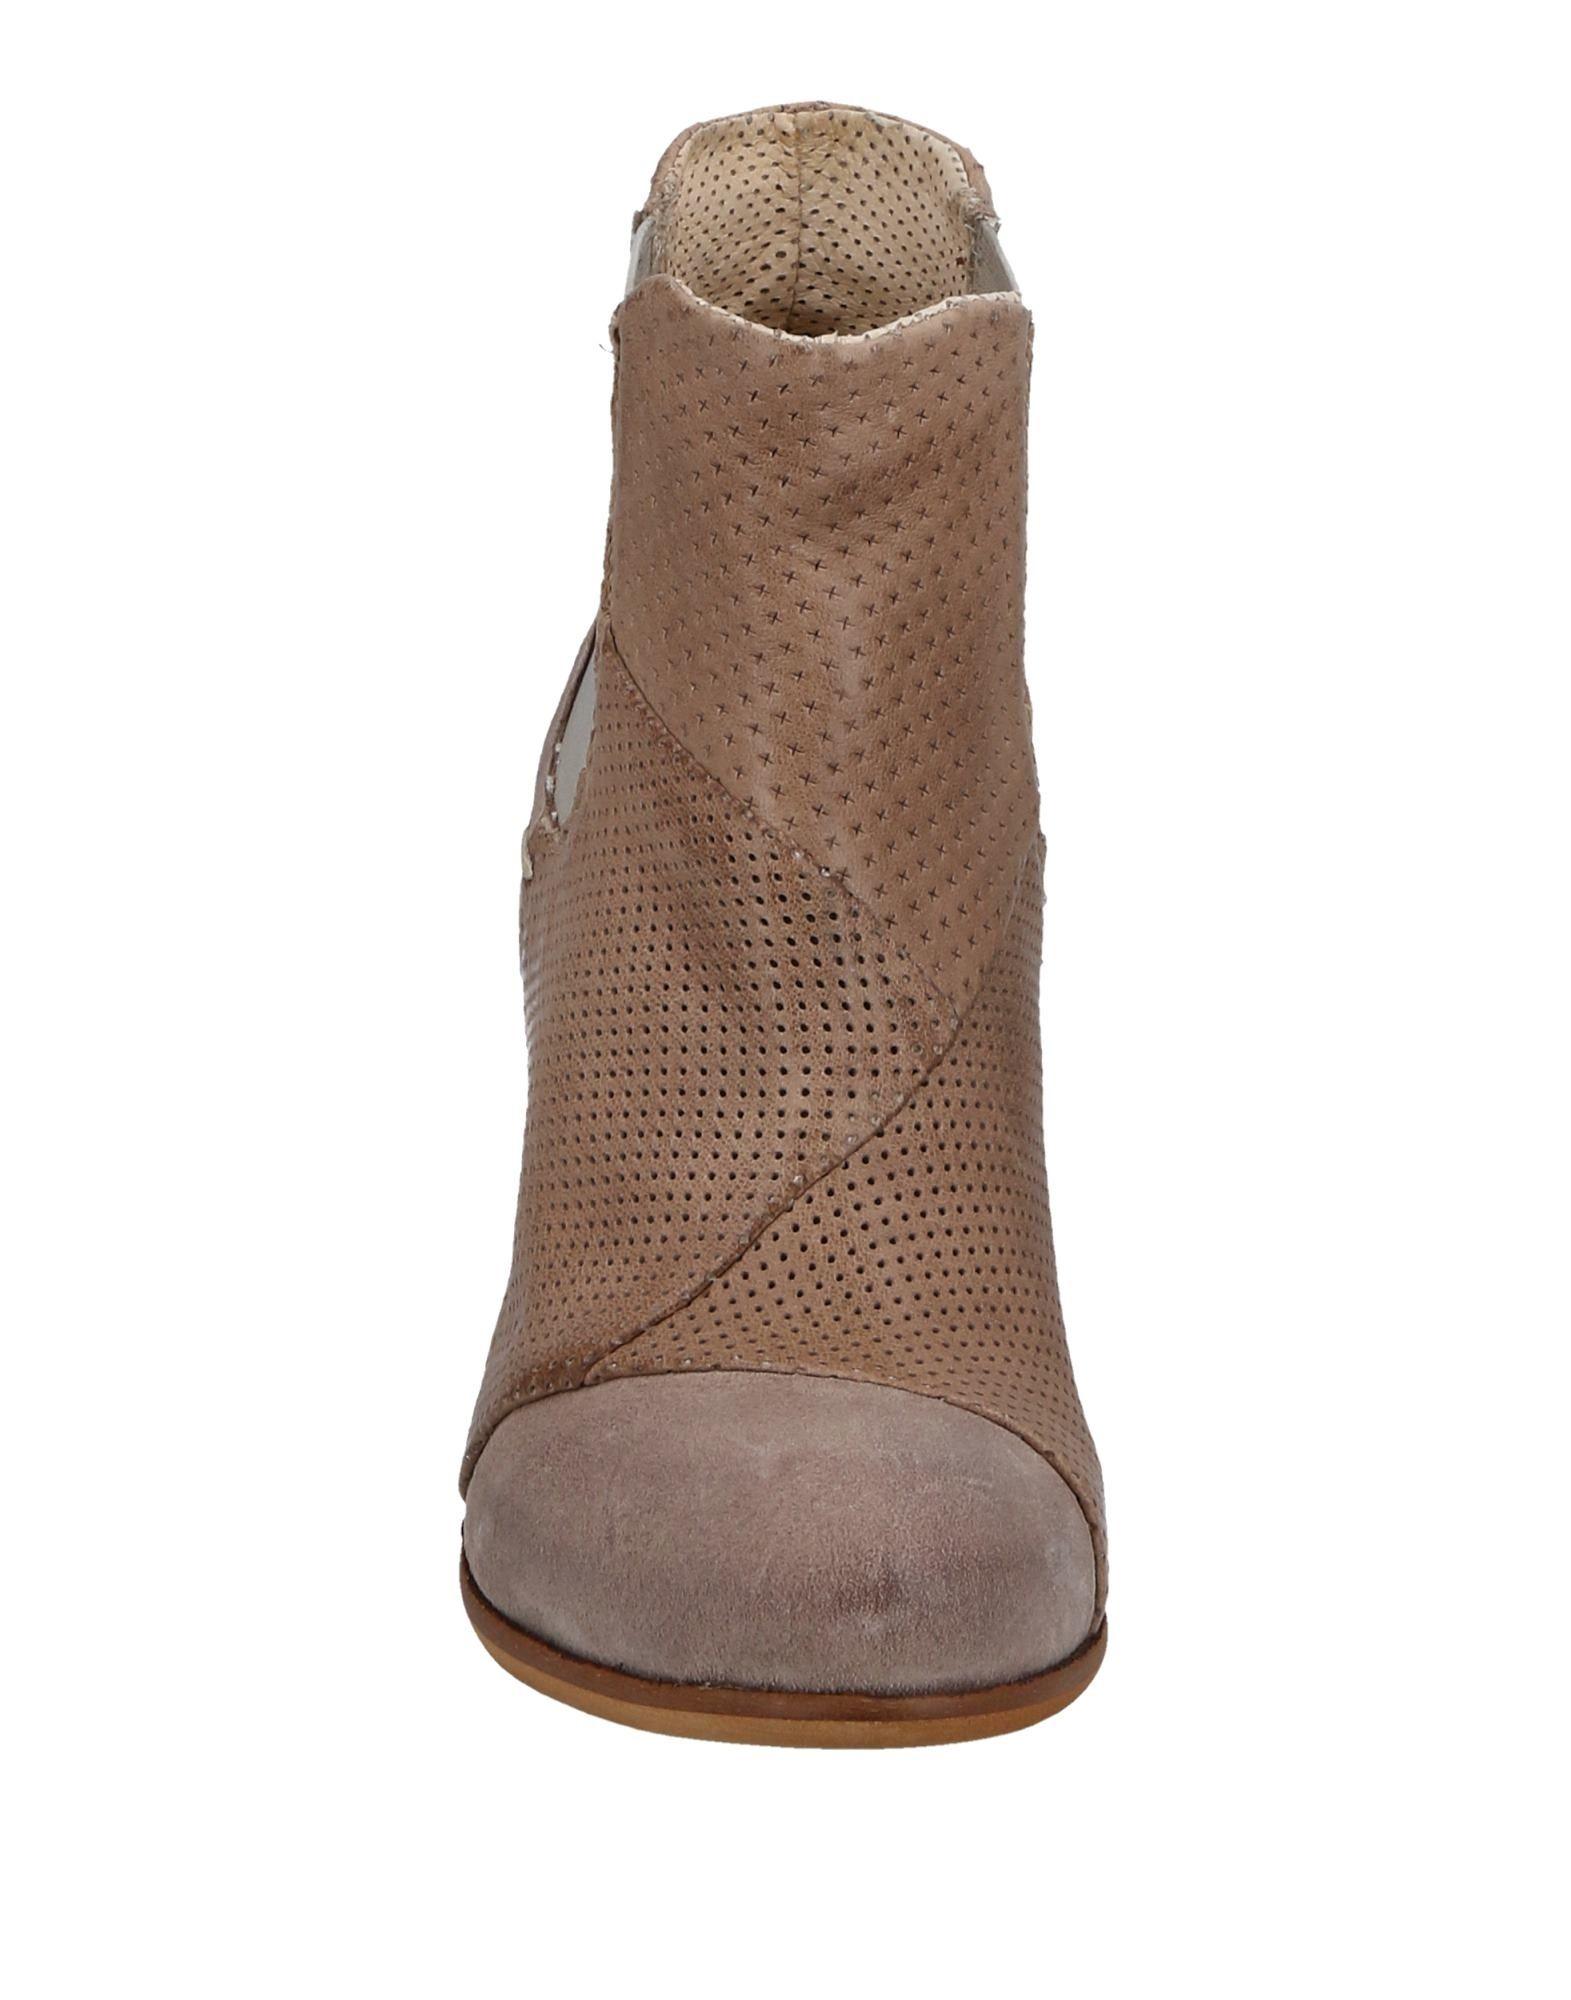 93d92e6d1ab4 Piranha Chelsea Boots Damen Boots 11506355FP 42a876 ...